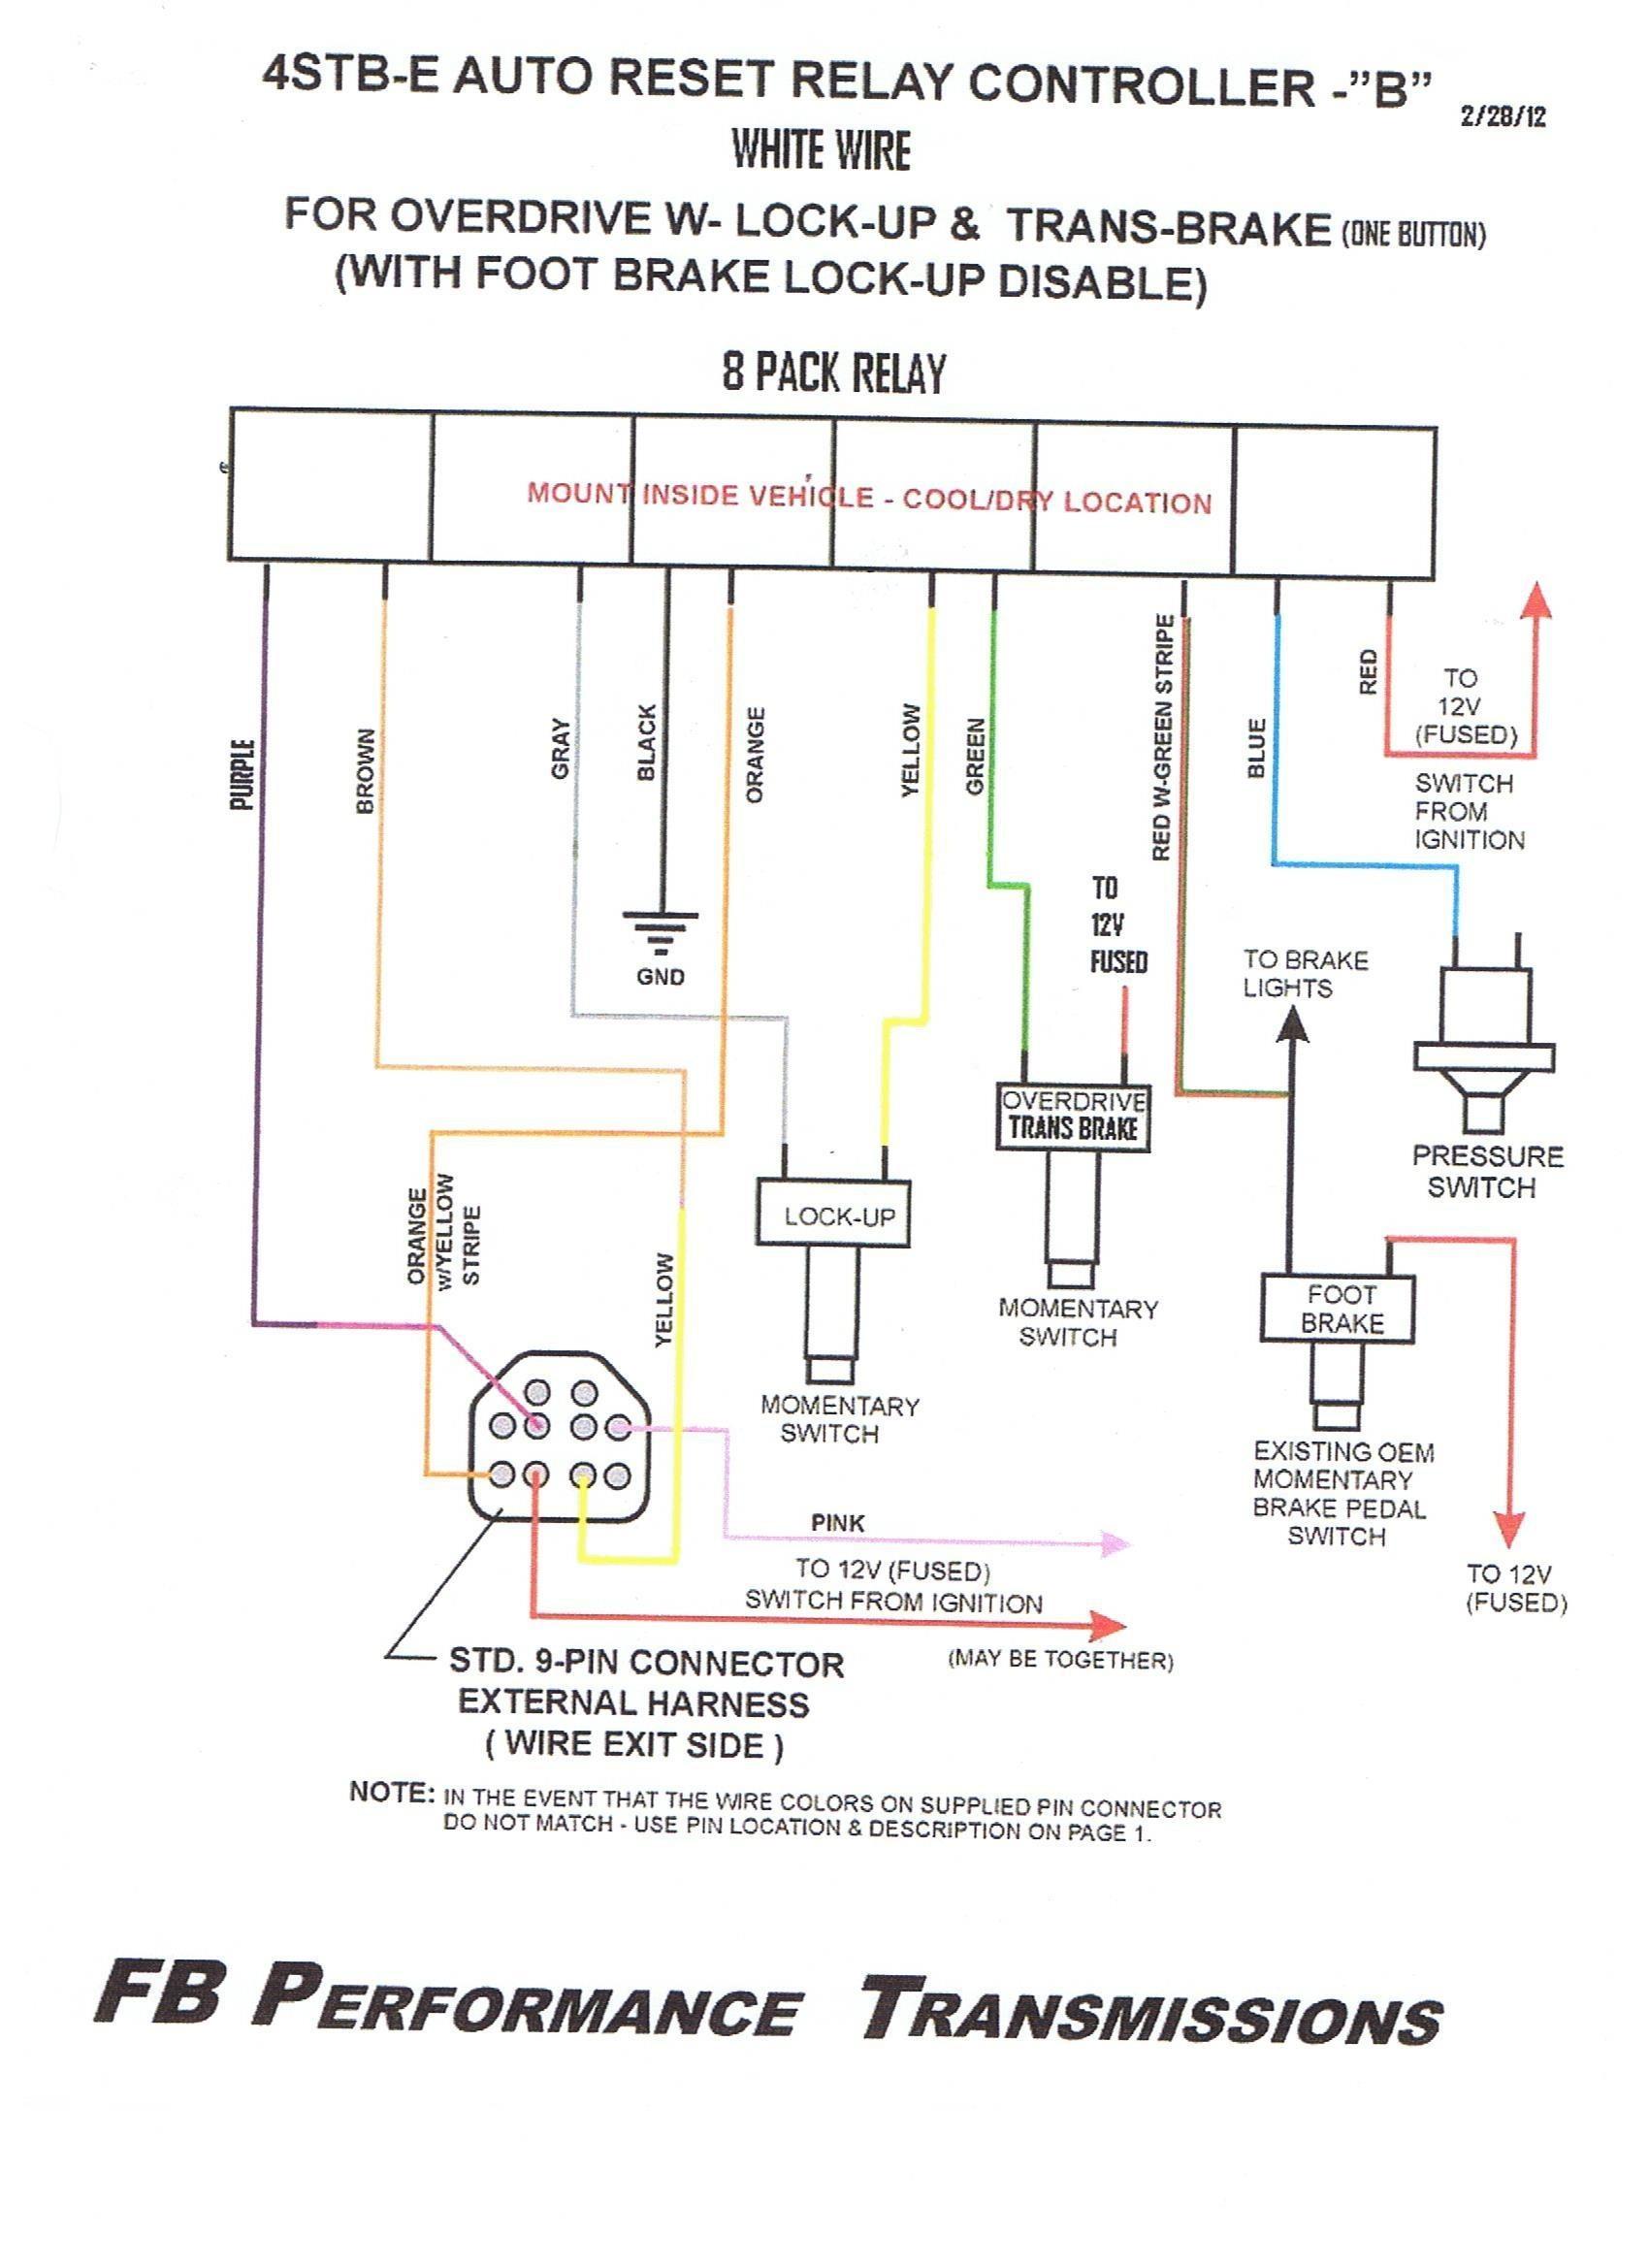 4l60e Wiring Diagram Fresh 4l60e Wiring Diagram Best 700r4 Transmission for